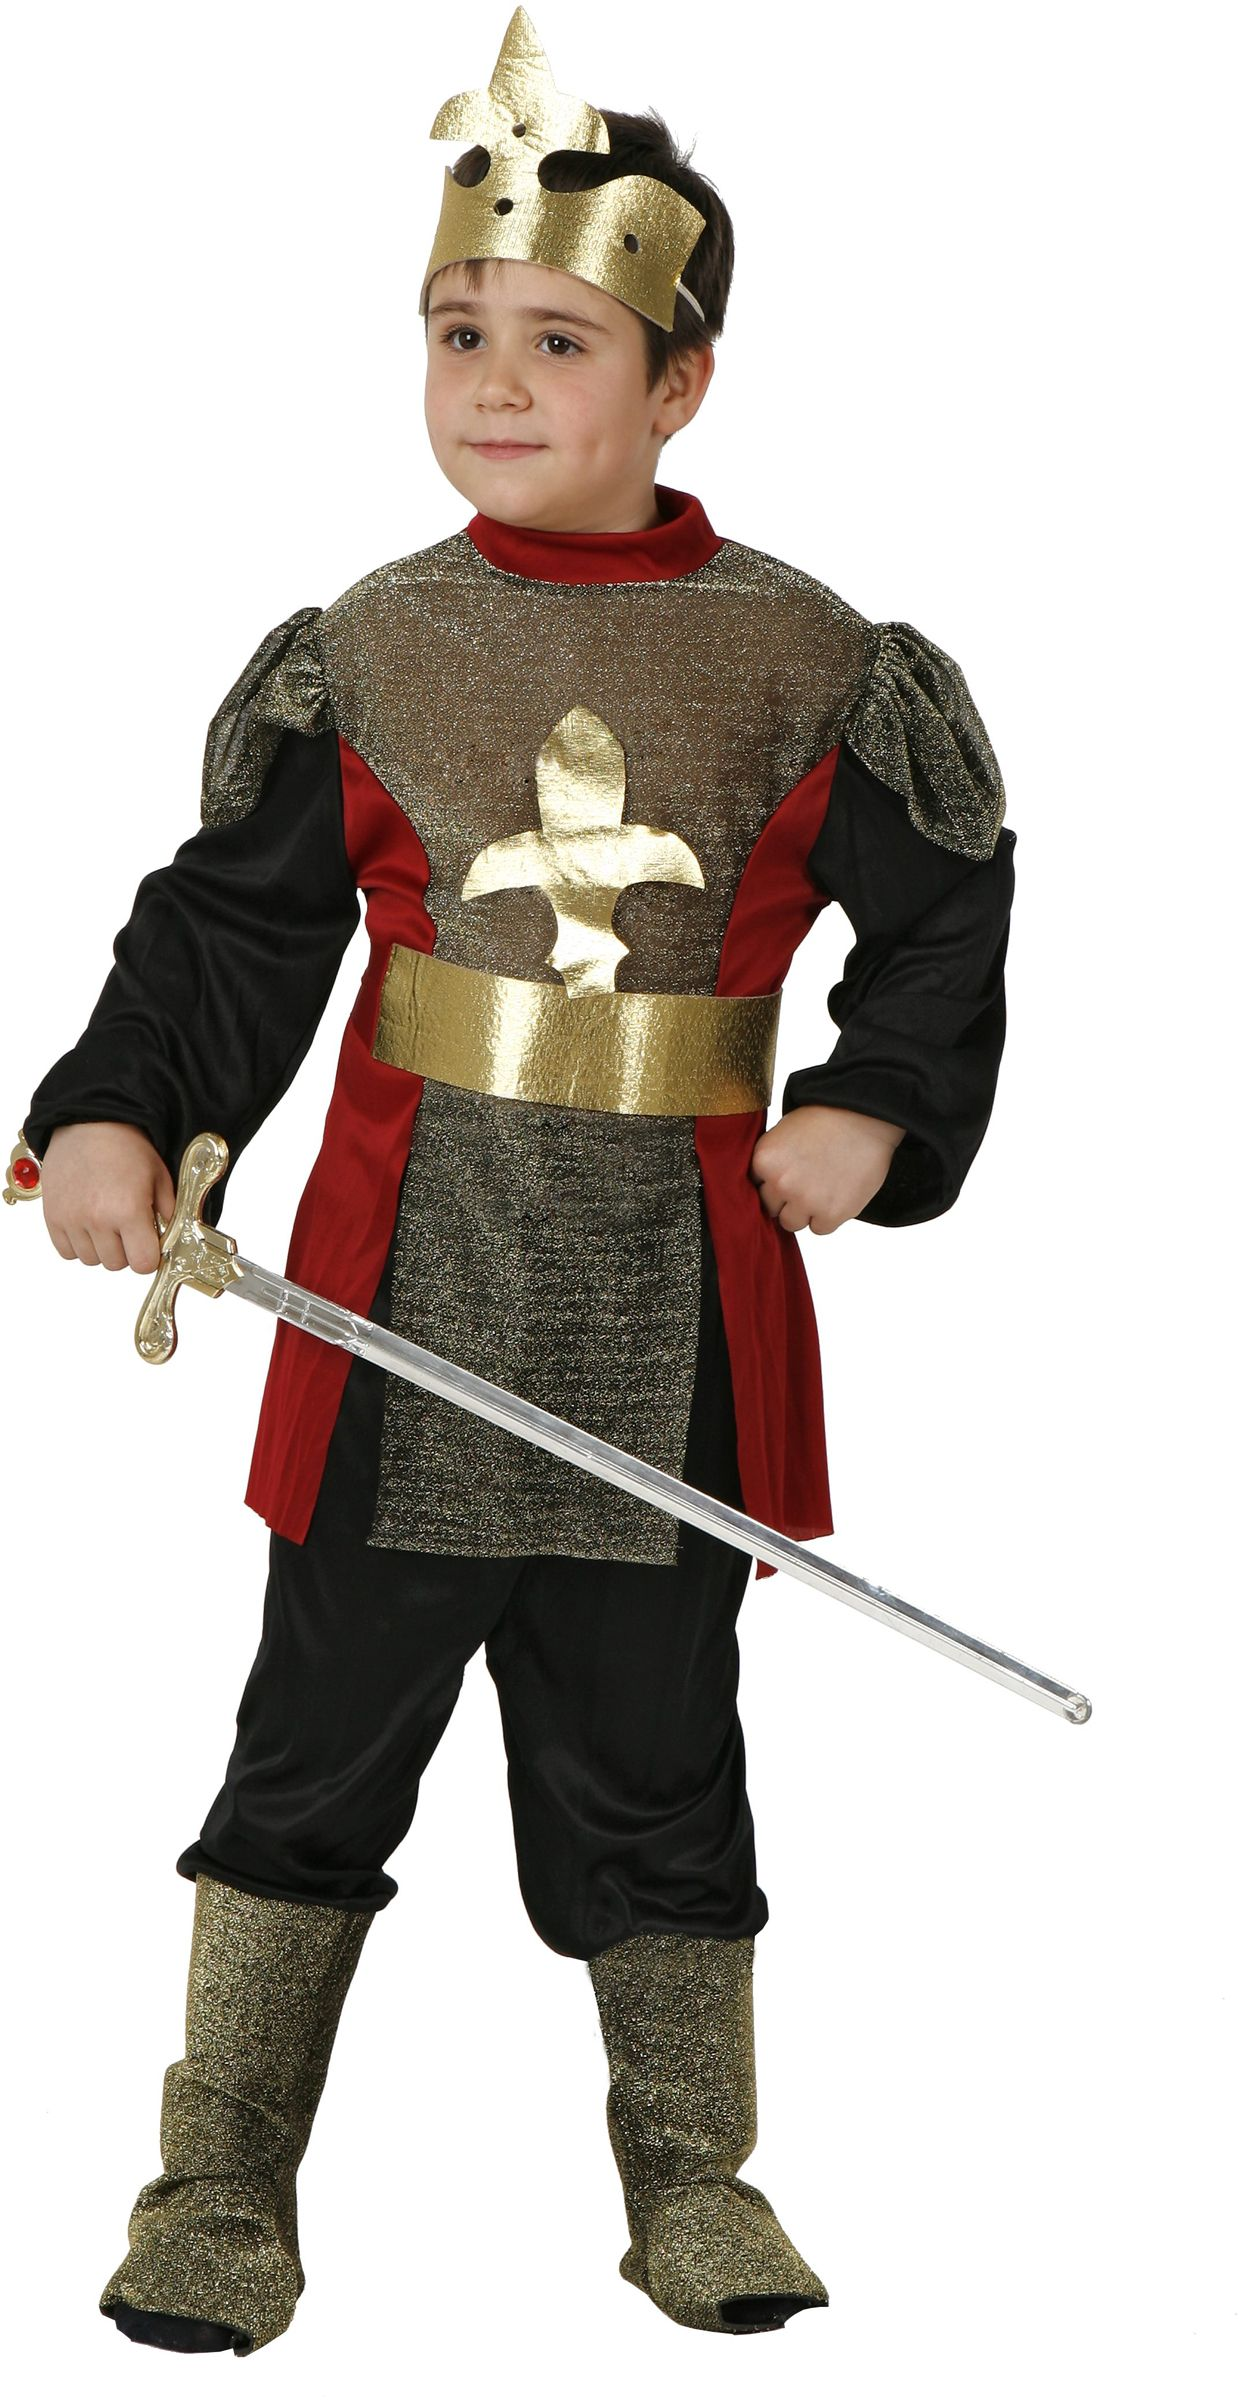 23d15d041 Disfraz de caballero flor de lys para niño | Halloween Costumes DESI ...